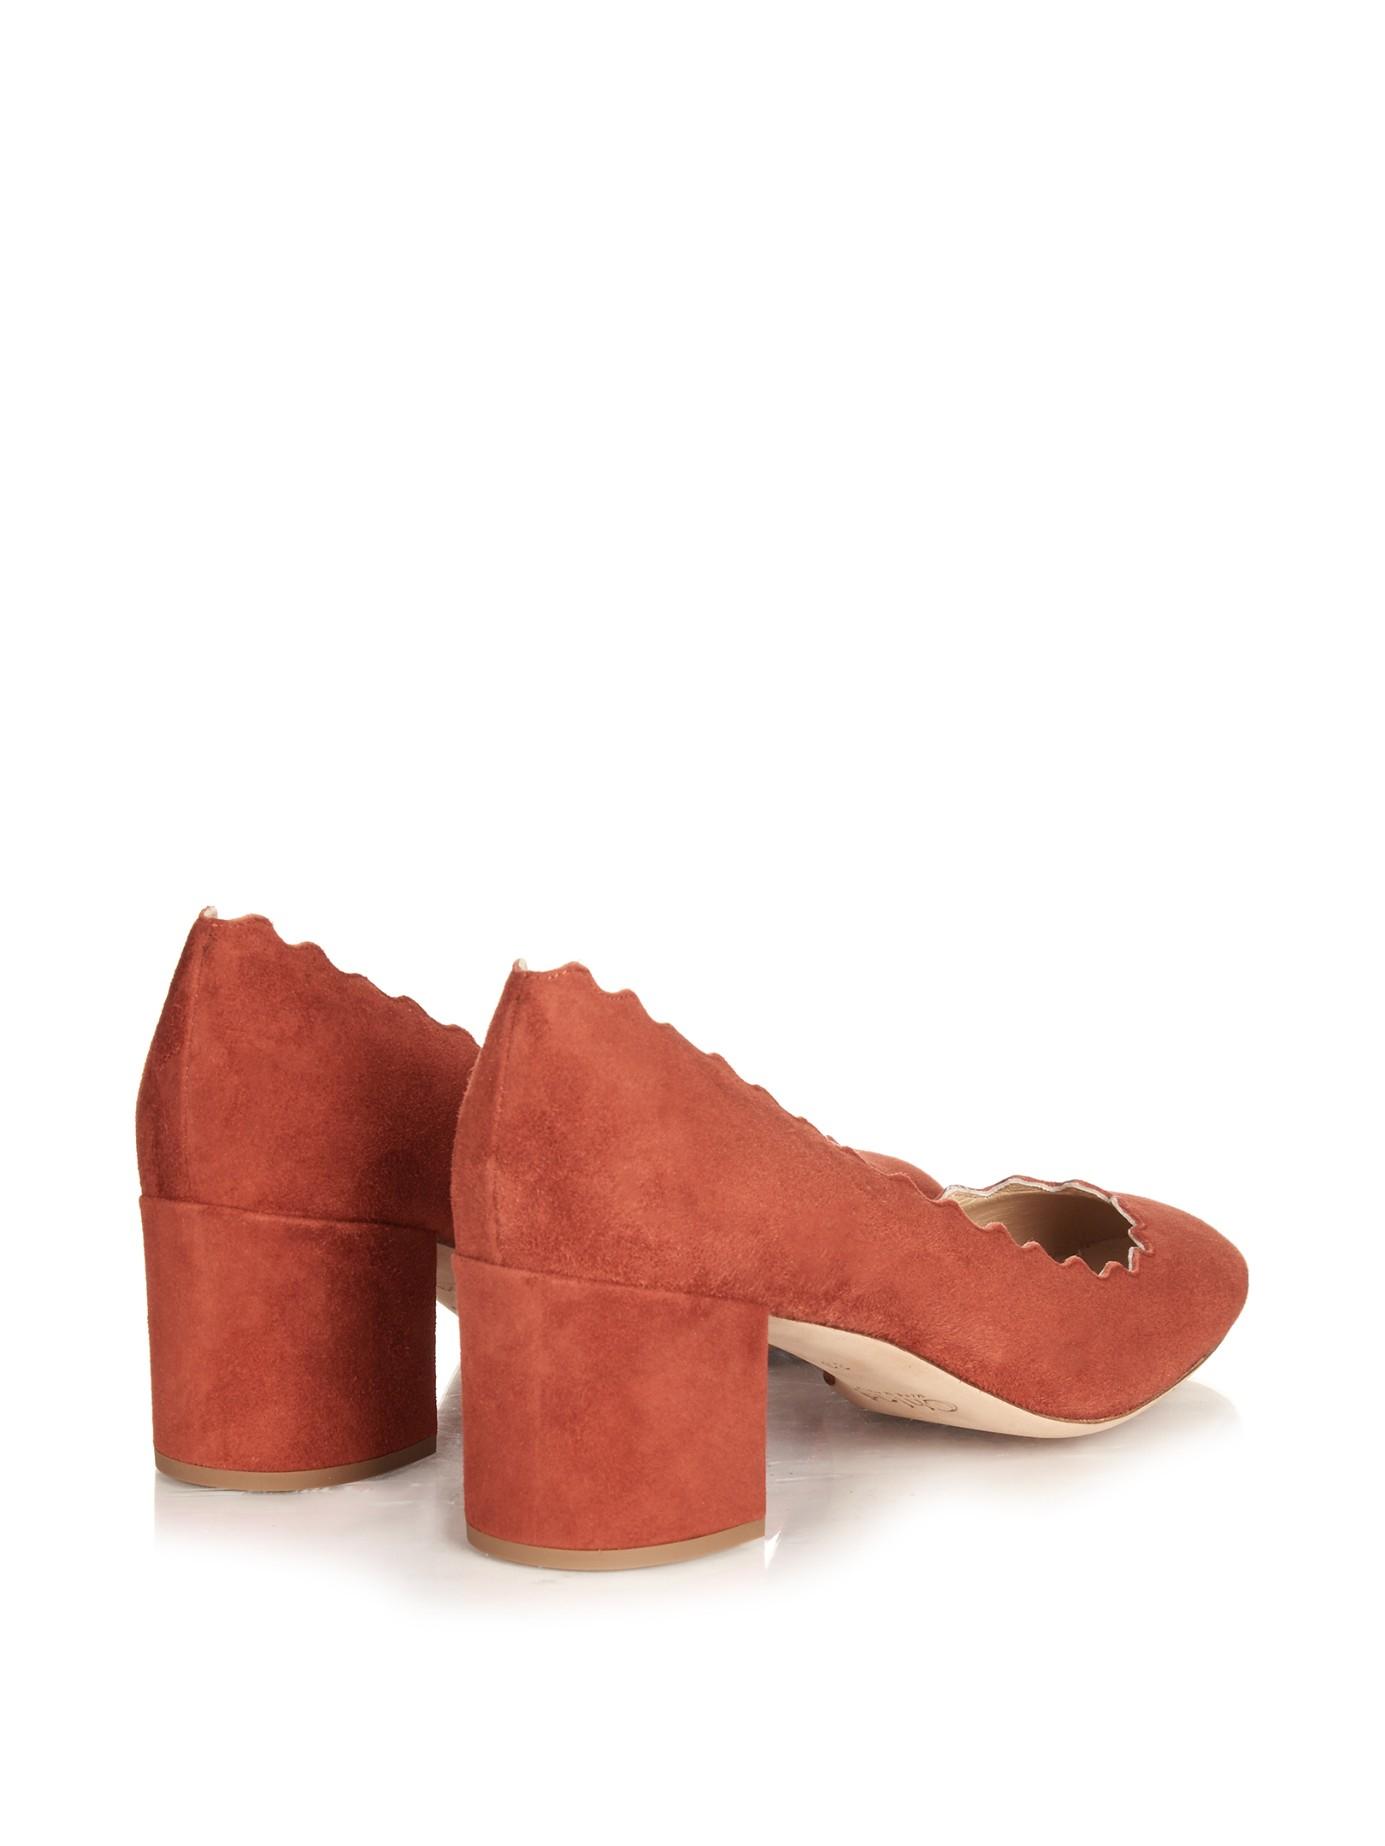 38b7e473b55 Lyst - Chloé Lauren Scallop-edged Block-heel Suede Pumps in Red